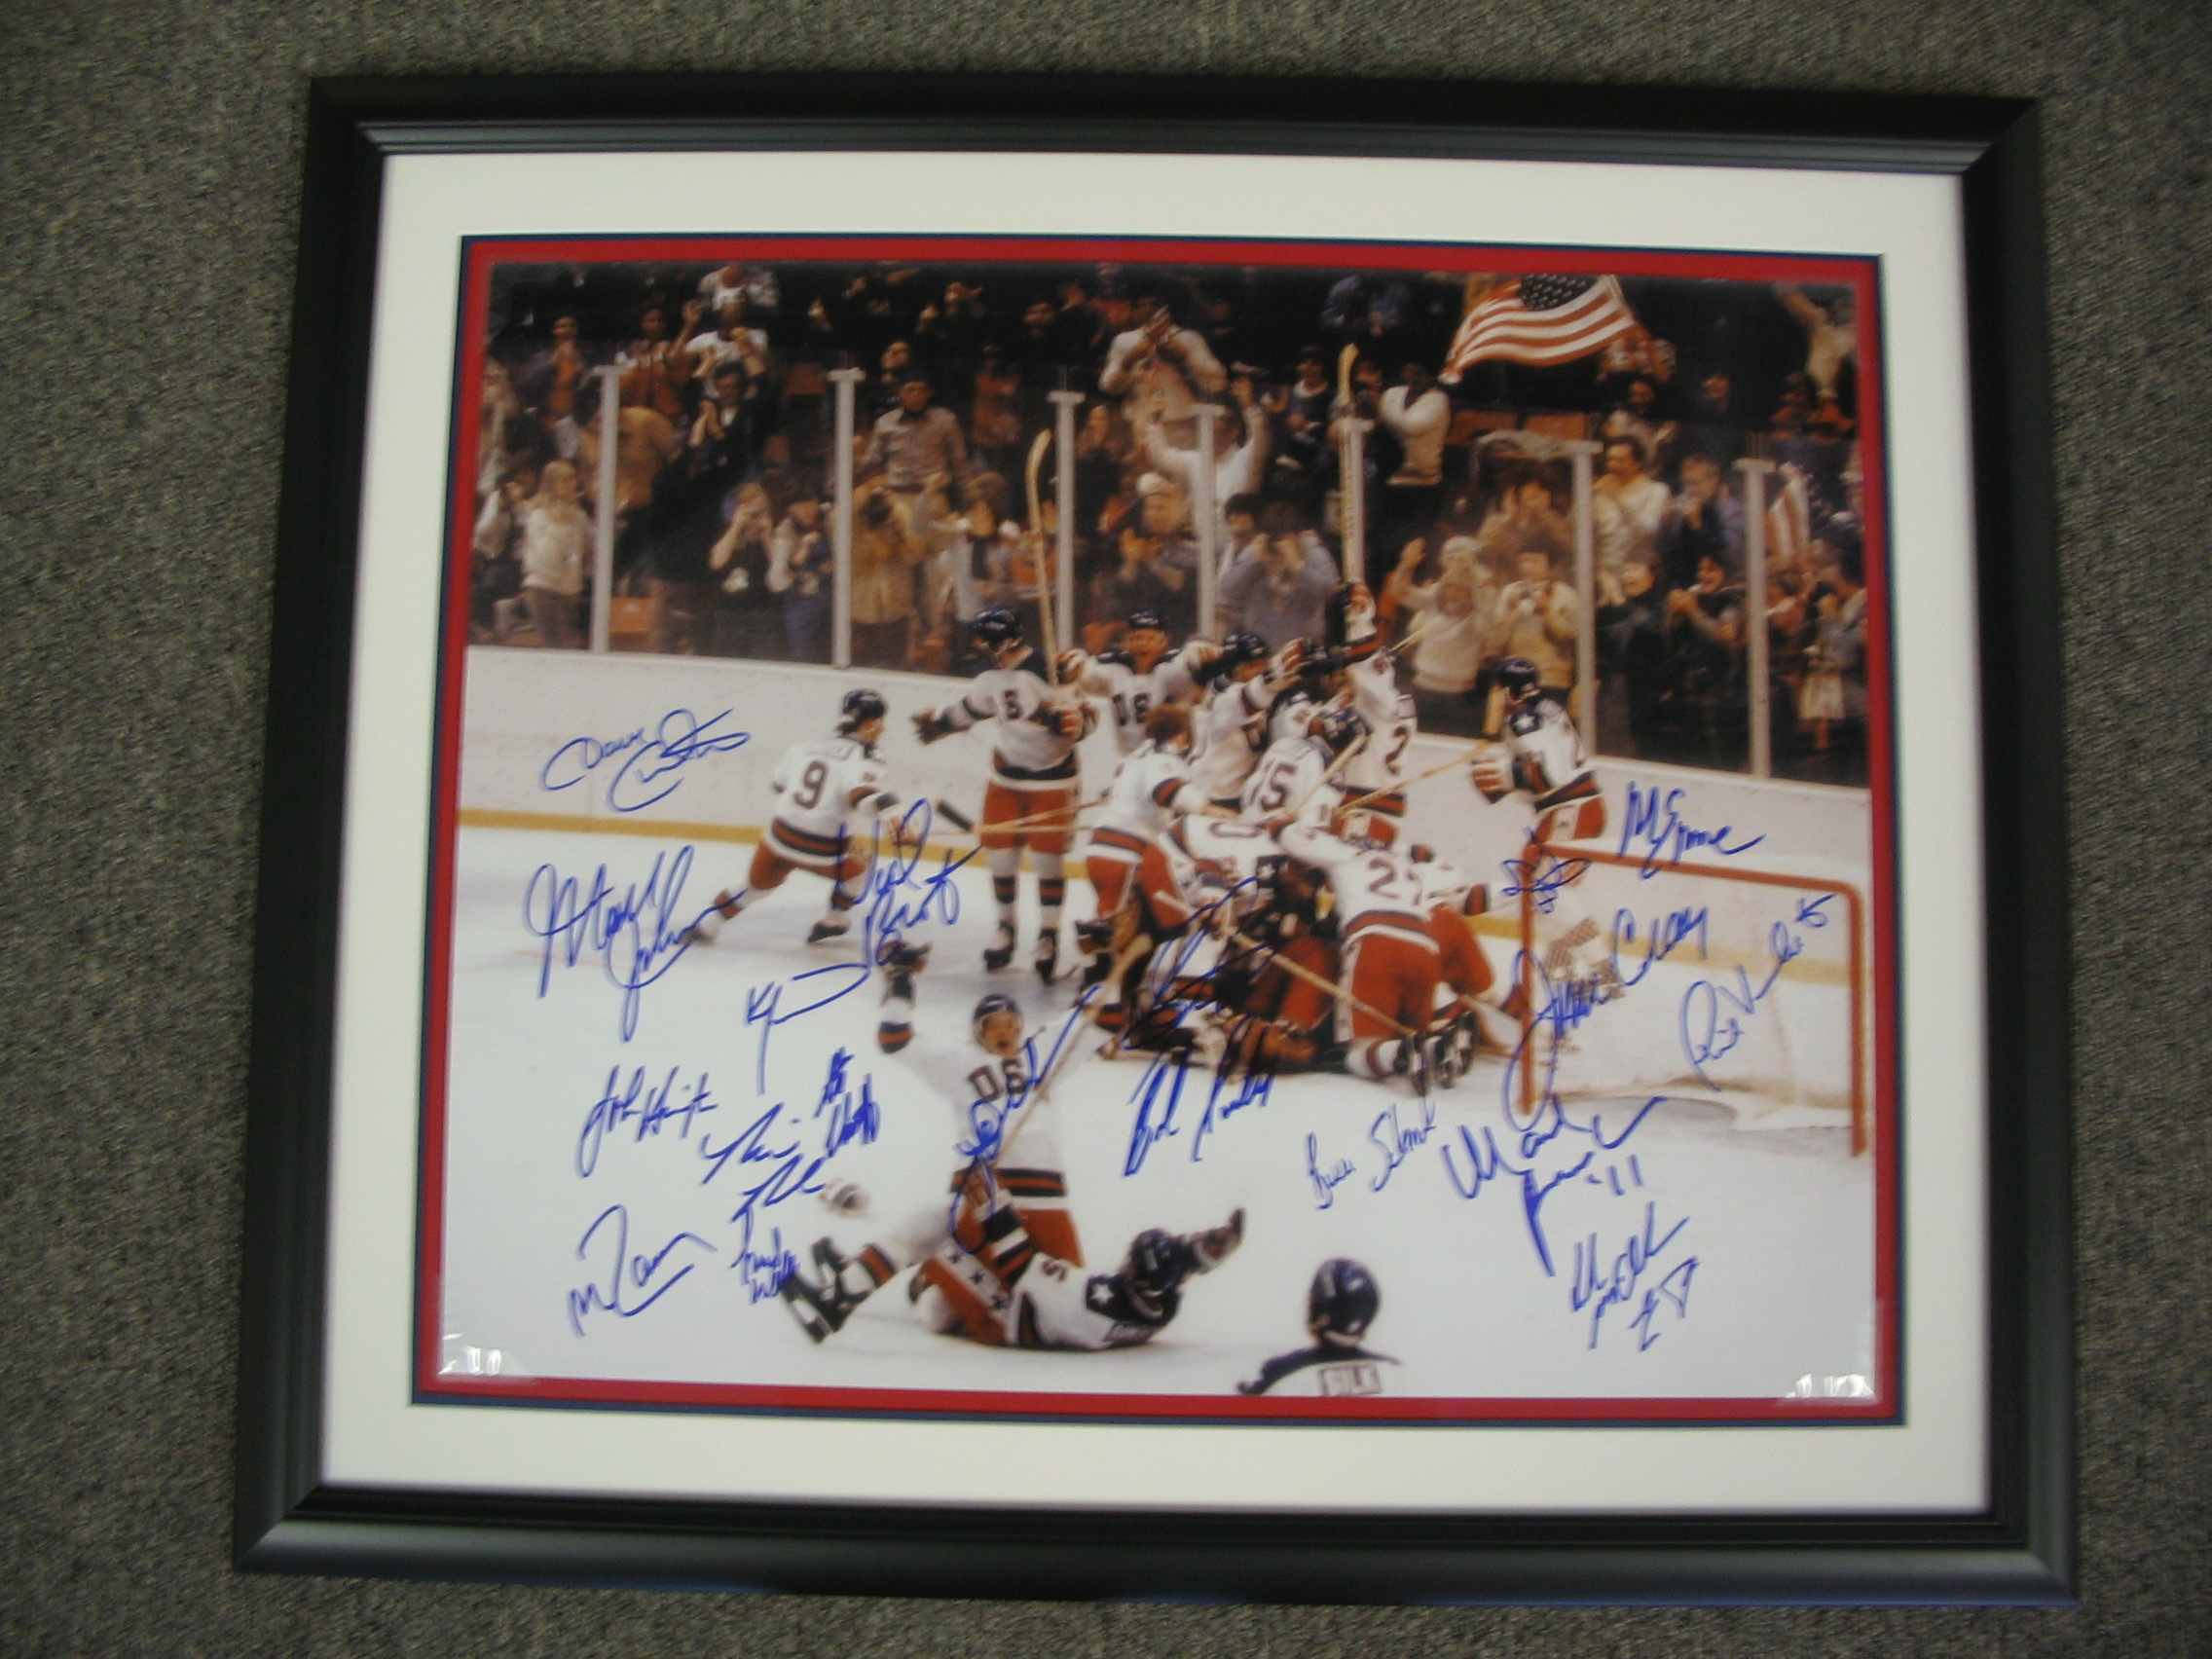 U.S.A. hockey framed by The Framemakers